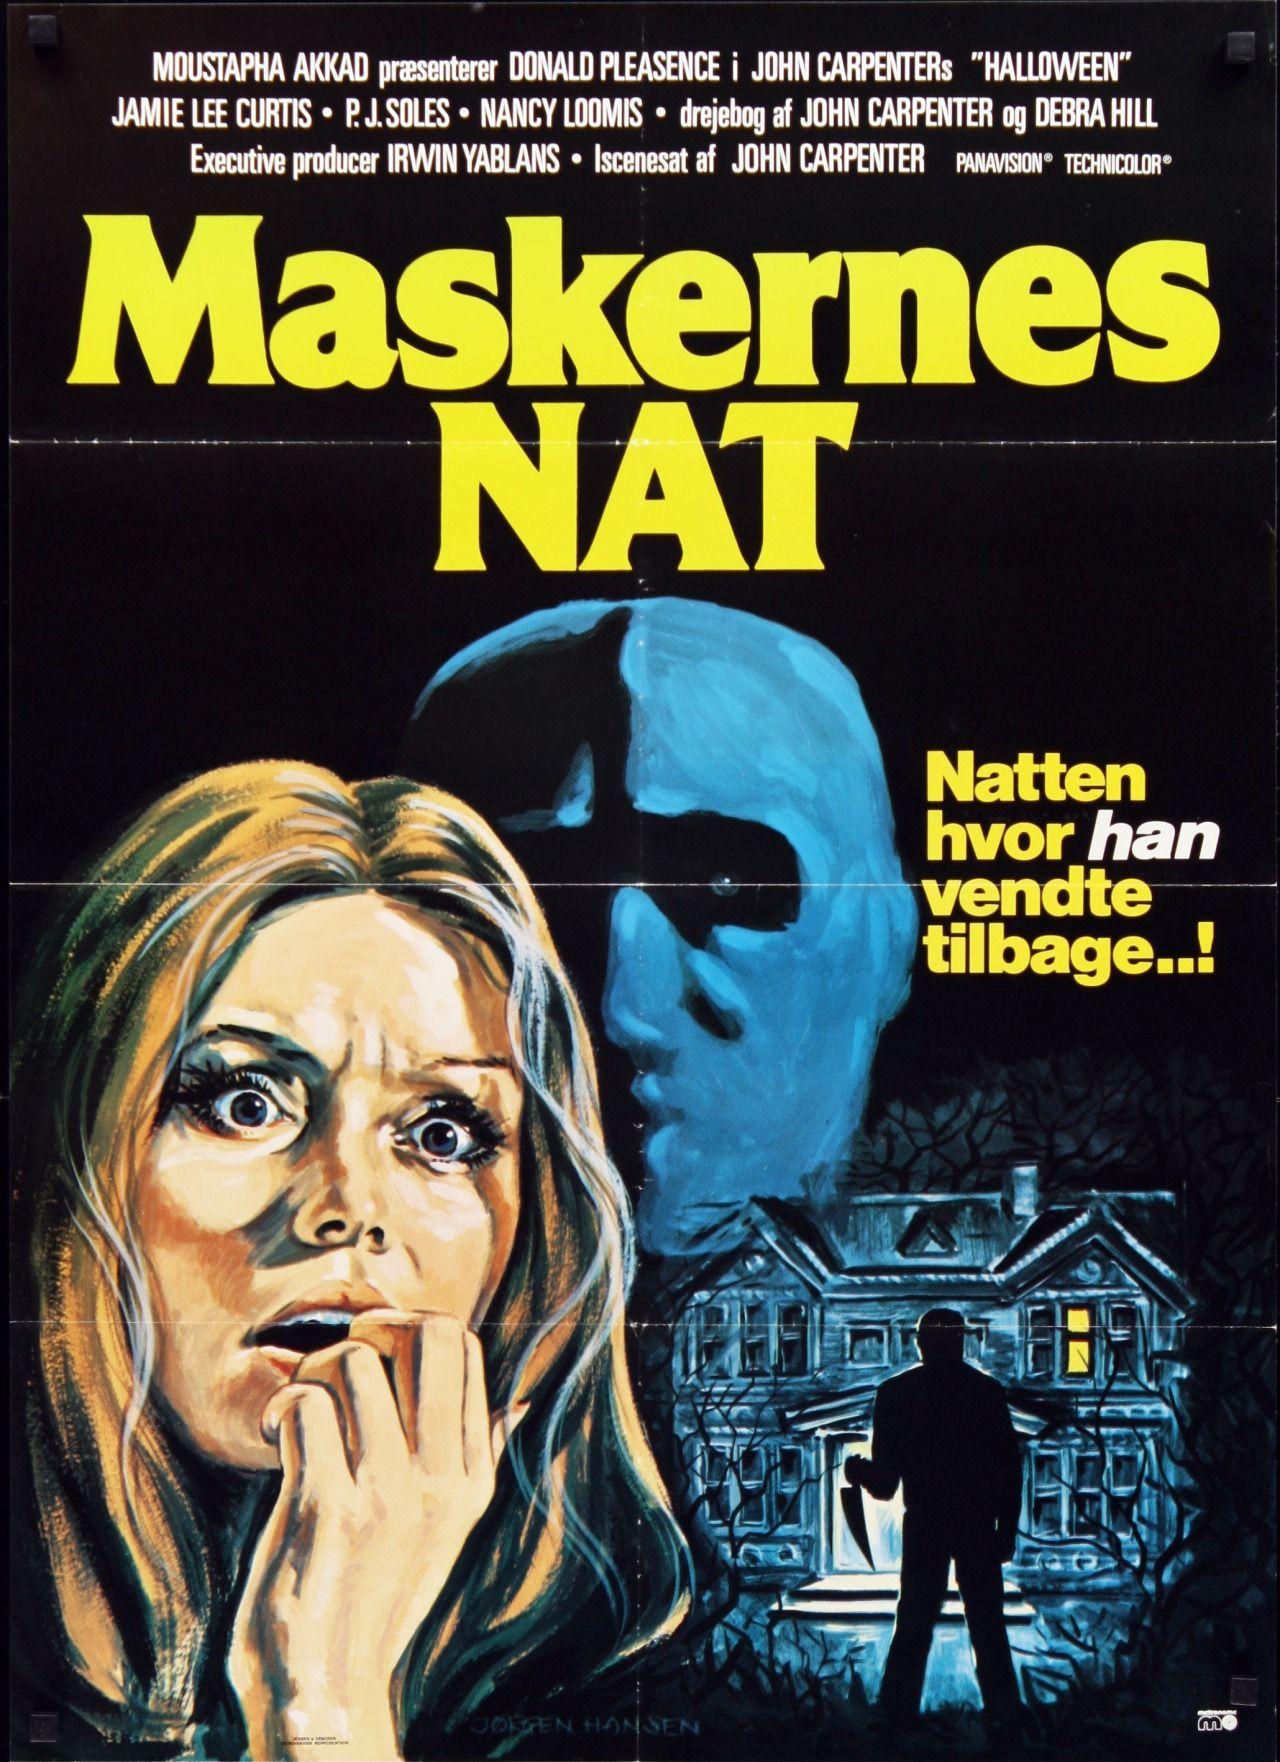 Halloween (1978). Danish poster by Hansen. John